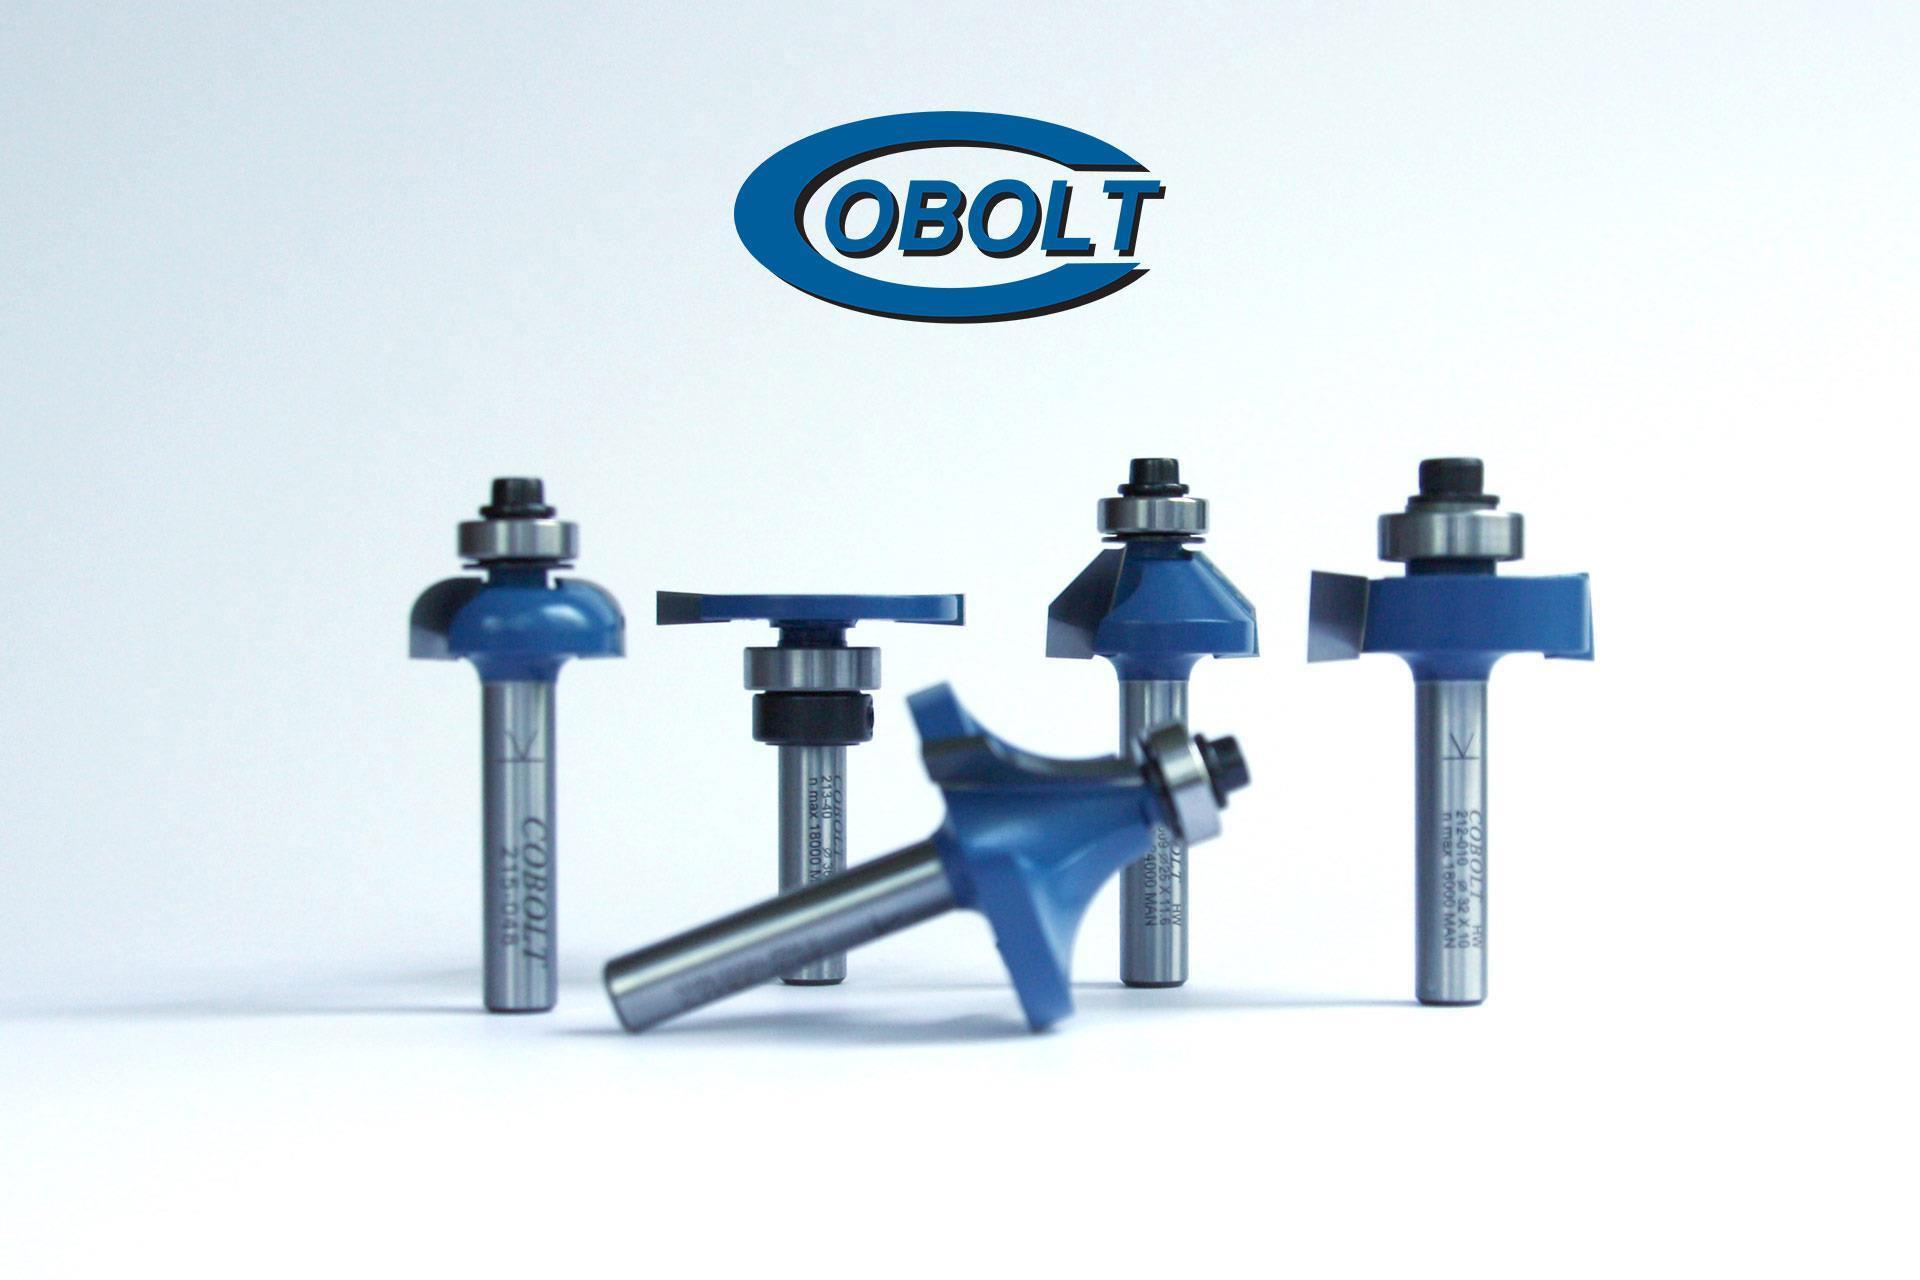 Om oss - Tool Trust AB